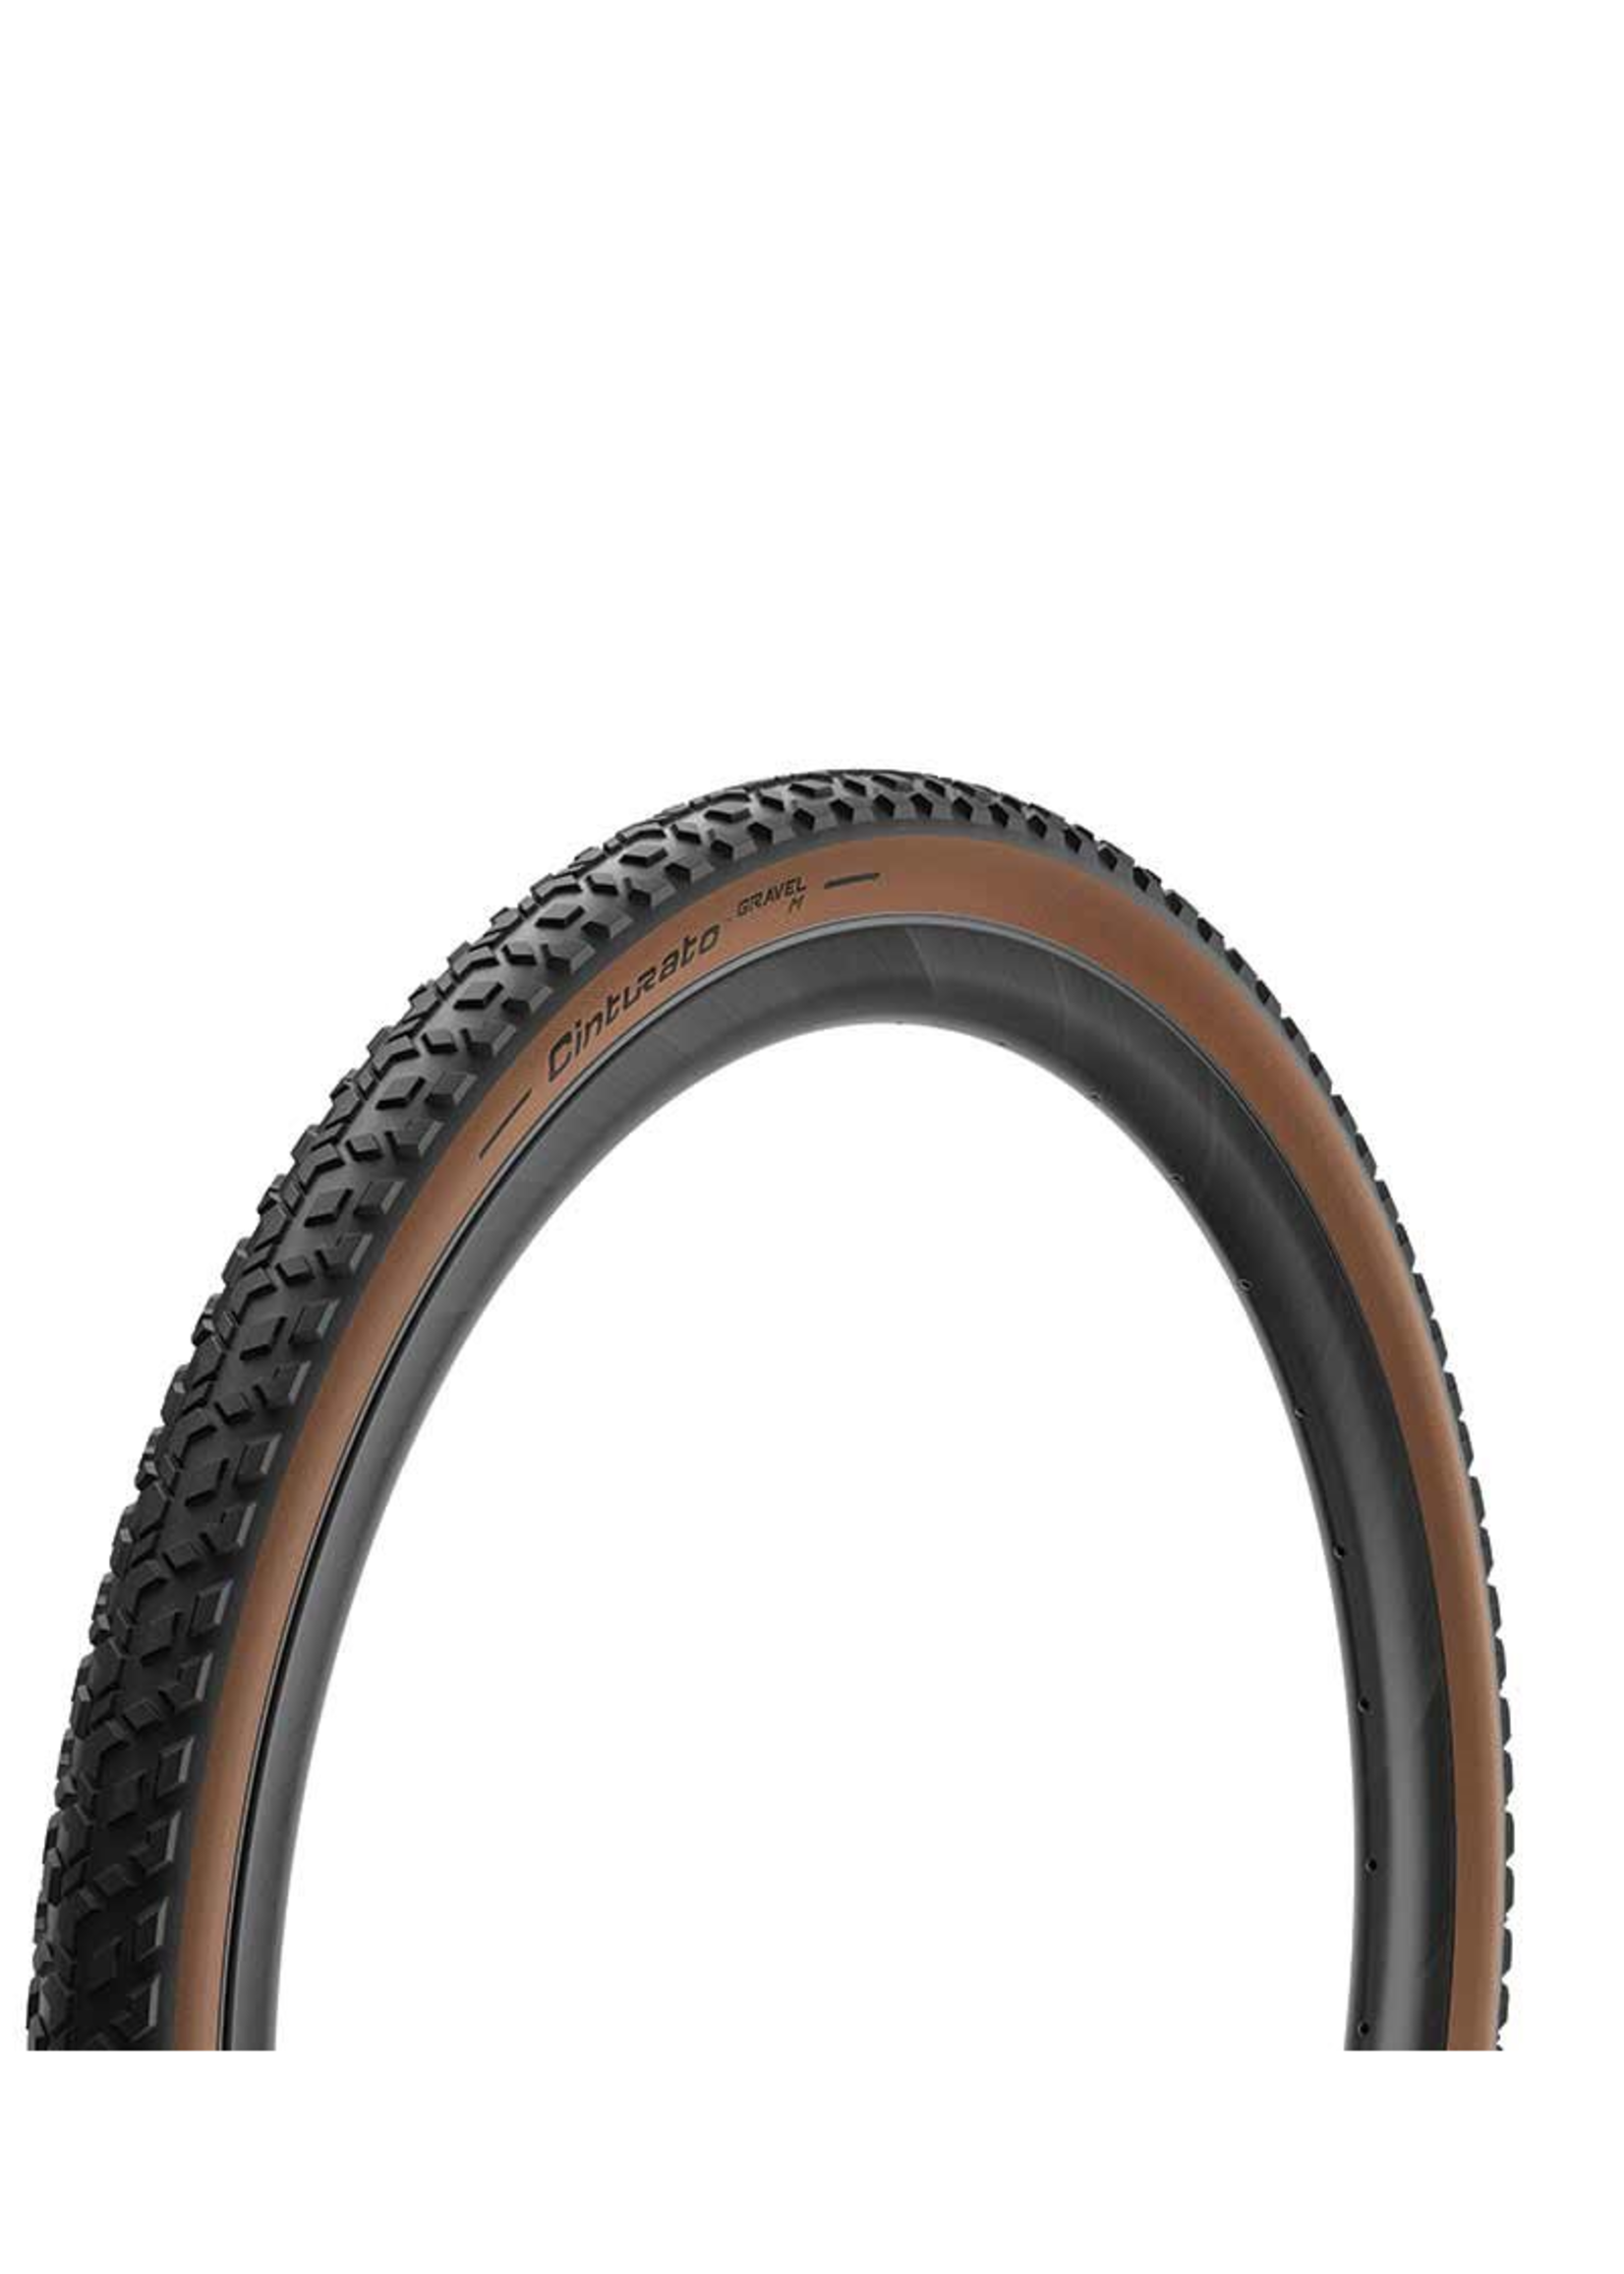 Pirelli Pirelli, Cinturato Gravel M, Pneu, 650Bx45, Pliable, Tubeless Ready, SpeedGrip, 127TPI, Flanc Beige